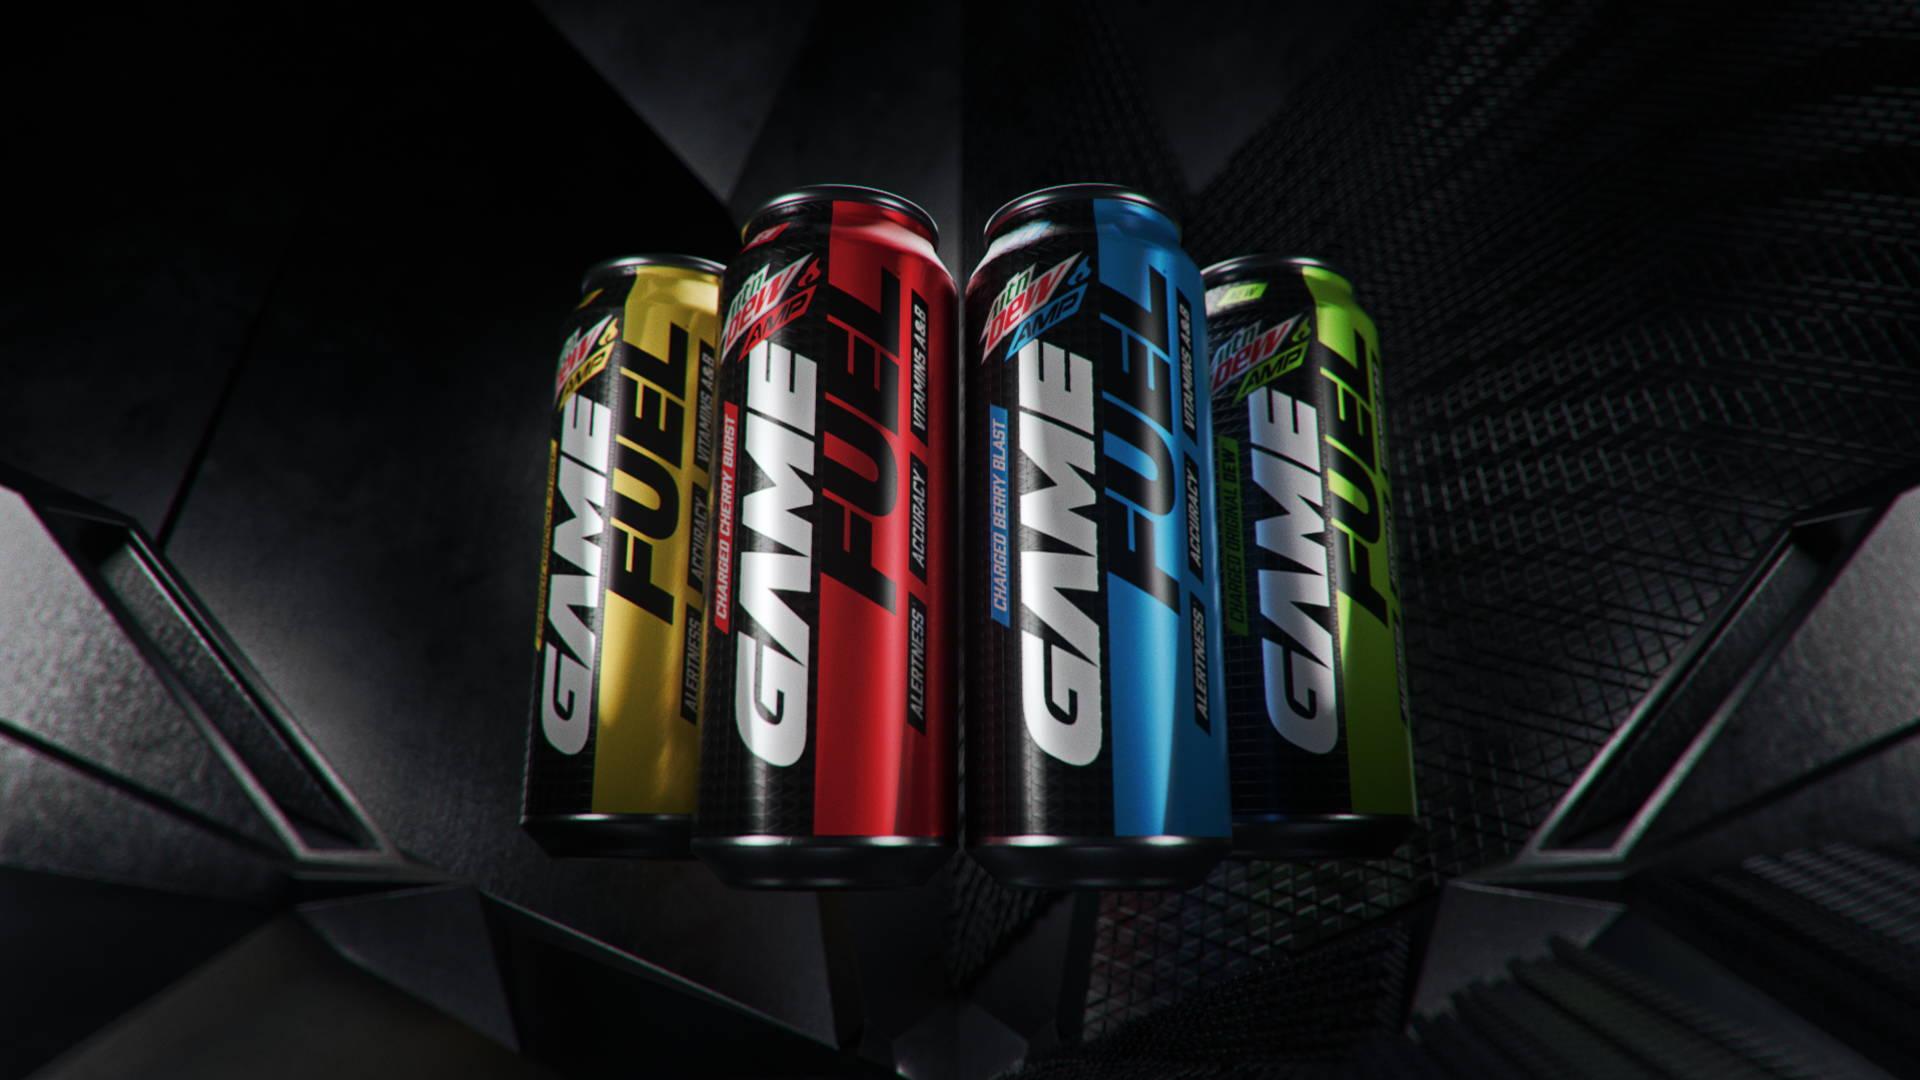 PepsiCo Design & Innovation On Crafting A Beverage For